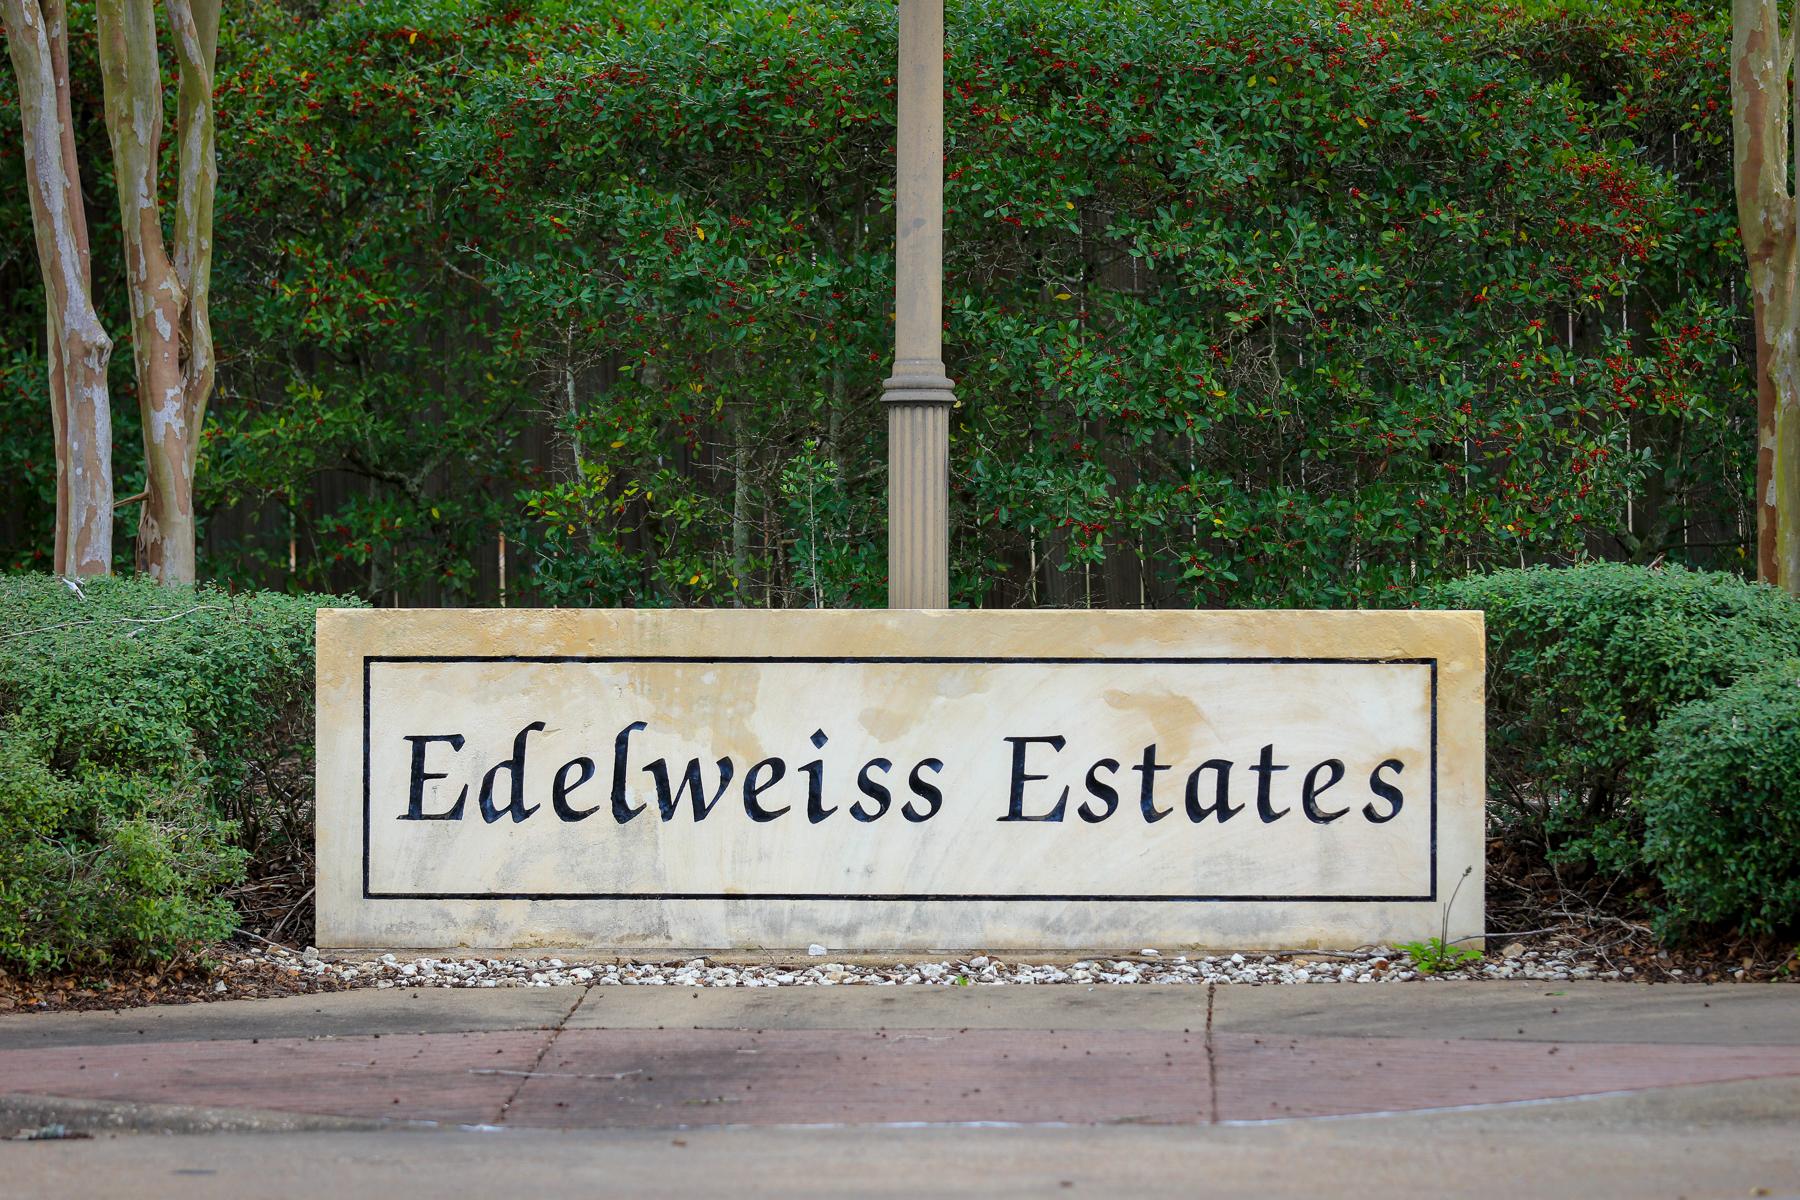 Edelweiss Estates